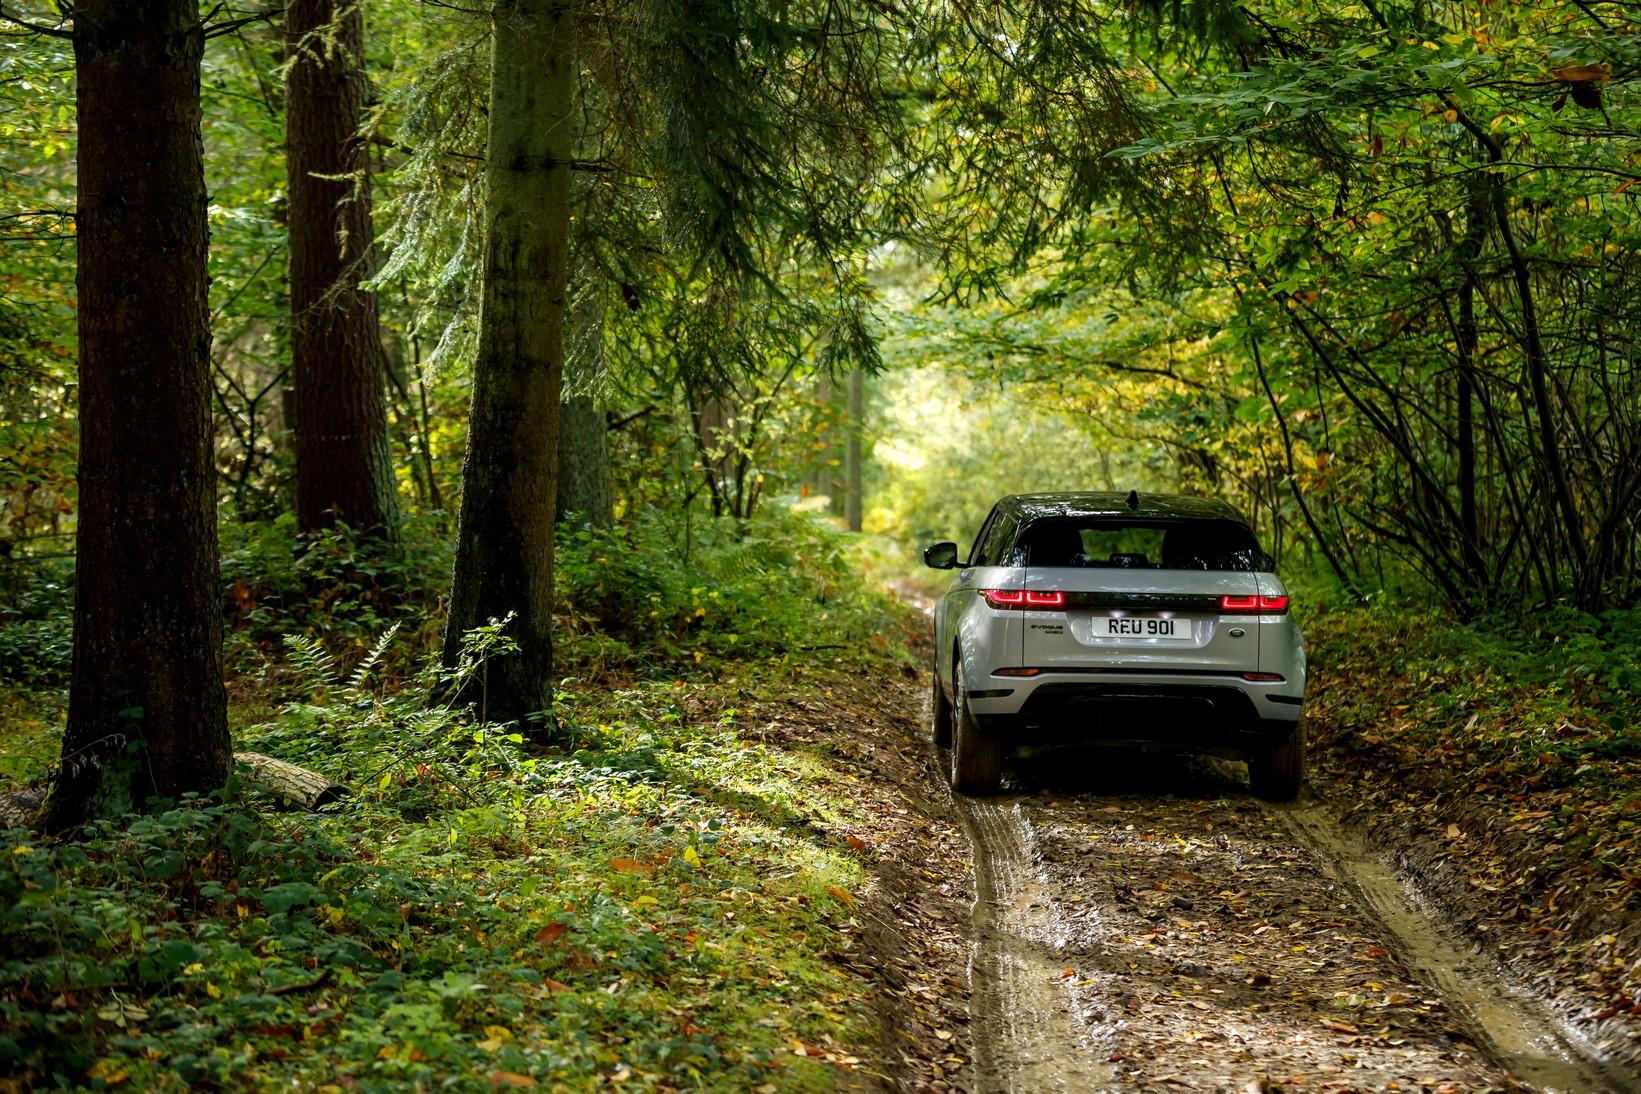 Land Rover Range Rover Evoque 2.0 D180 SE 5dr Auto image 3